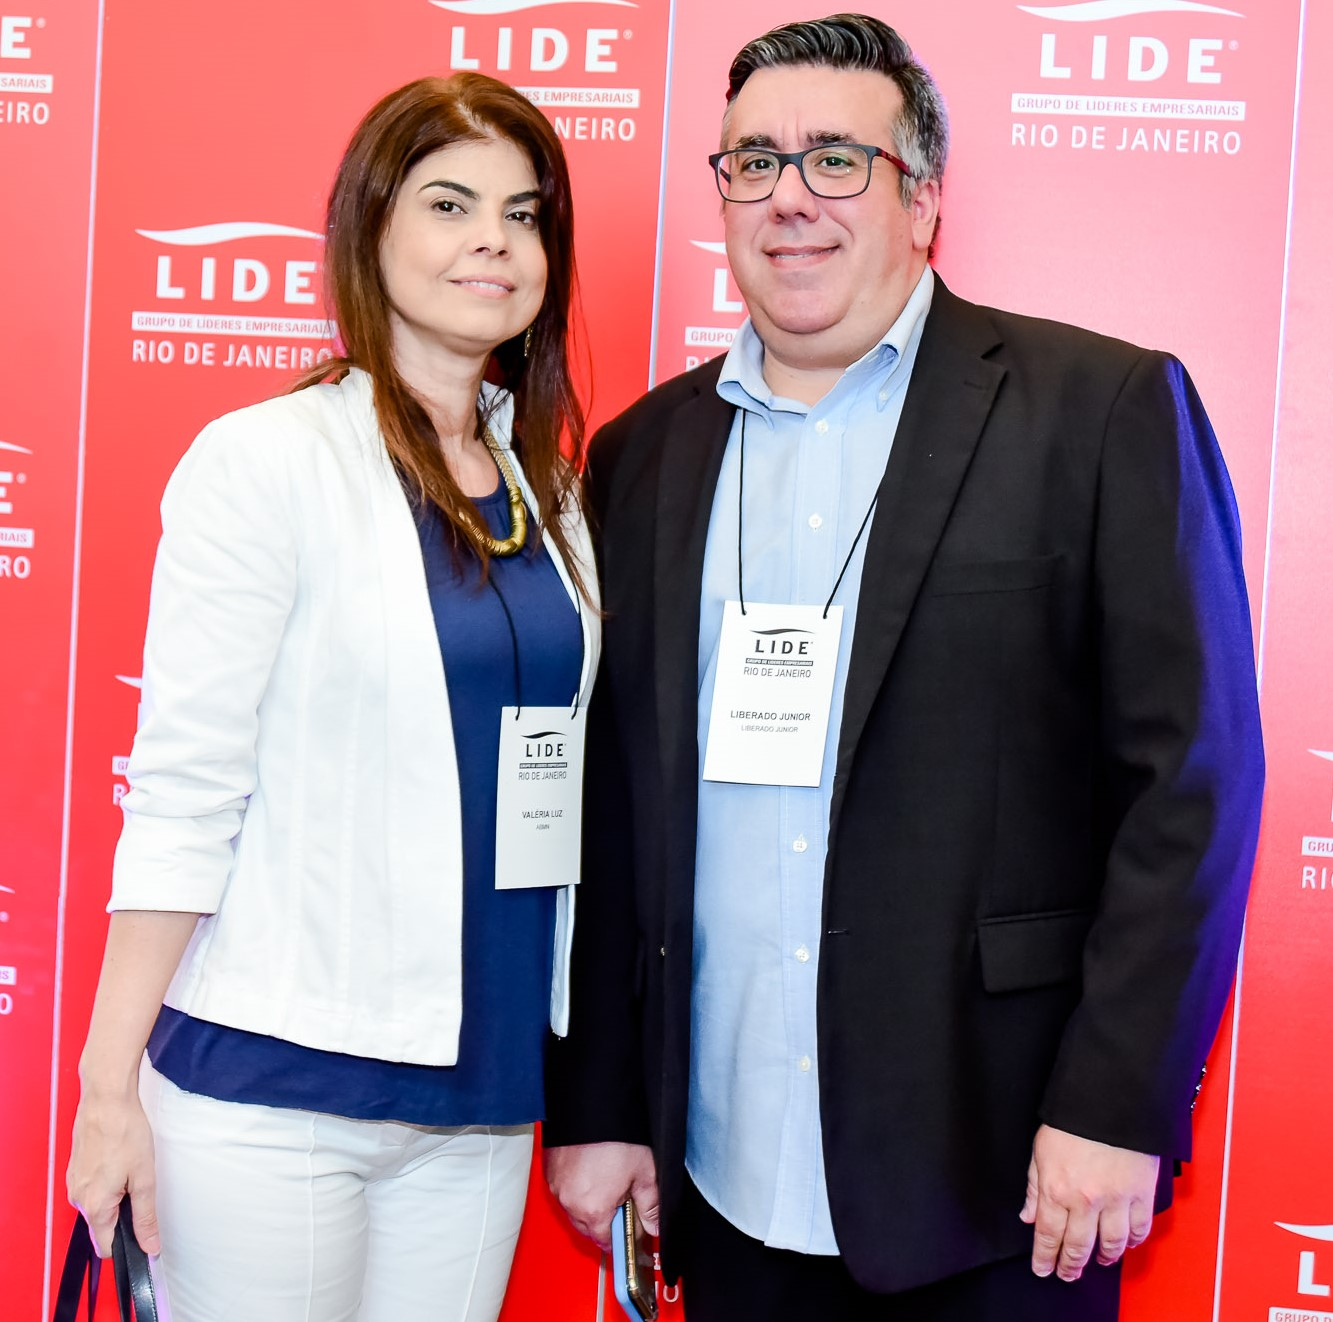 Valeria Luz e Liberardo Junior /Foto: Renato Wrobel